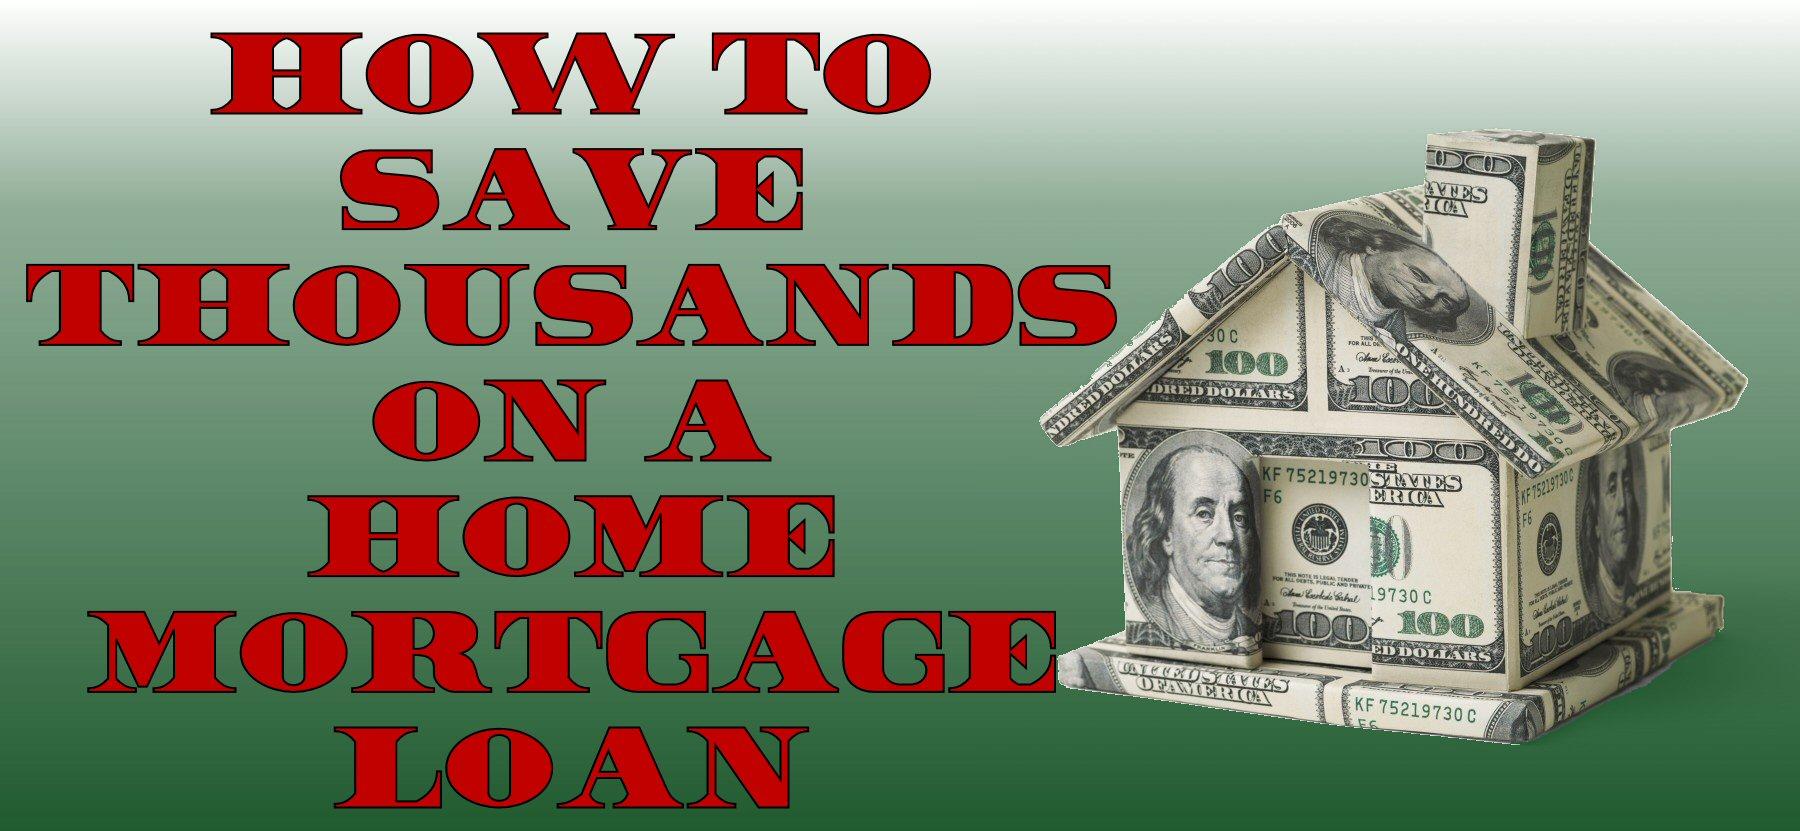 How To Save Thousands On a Home Loan Mortgage #Finance #Savings